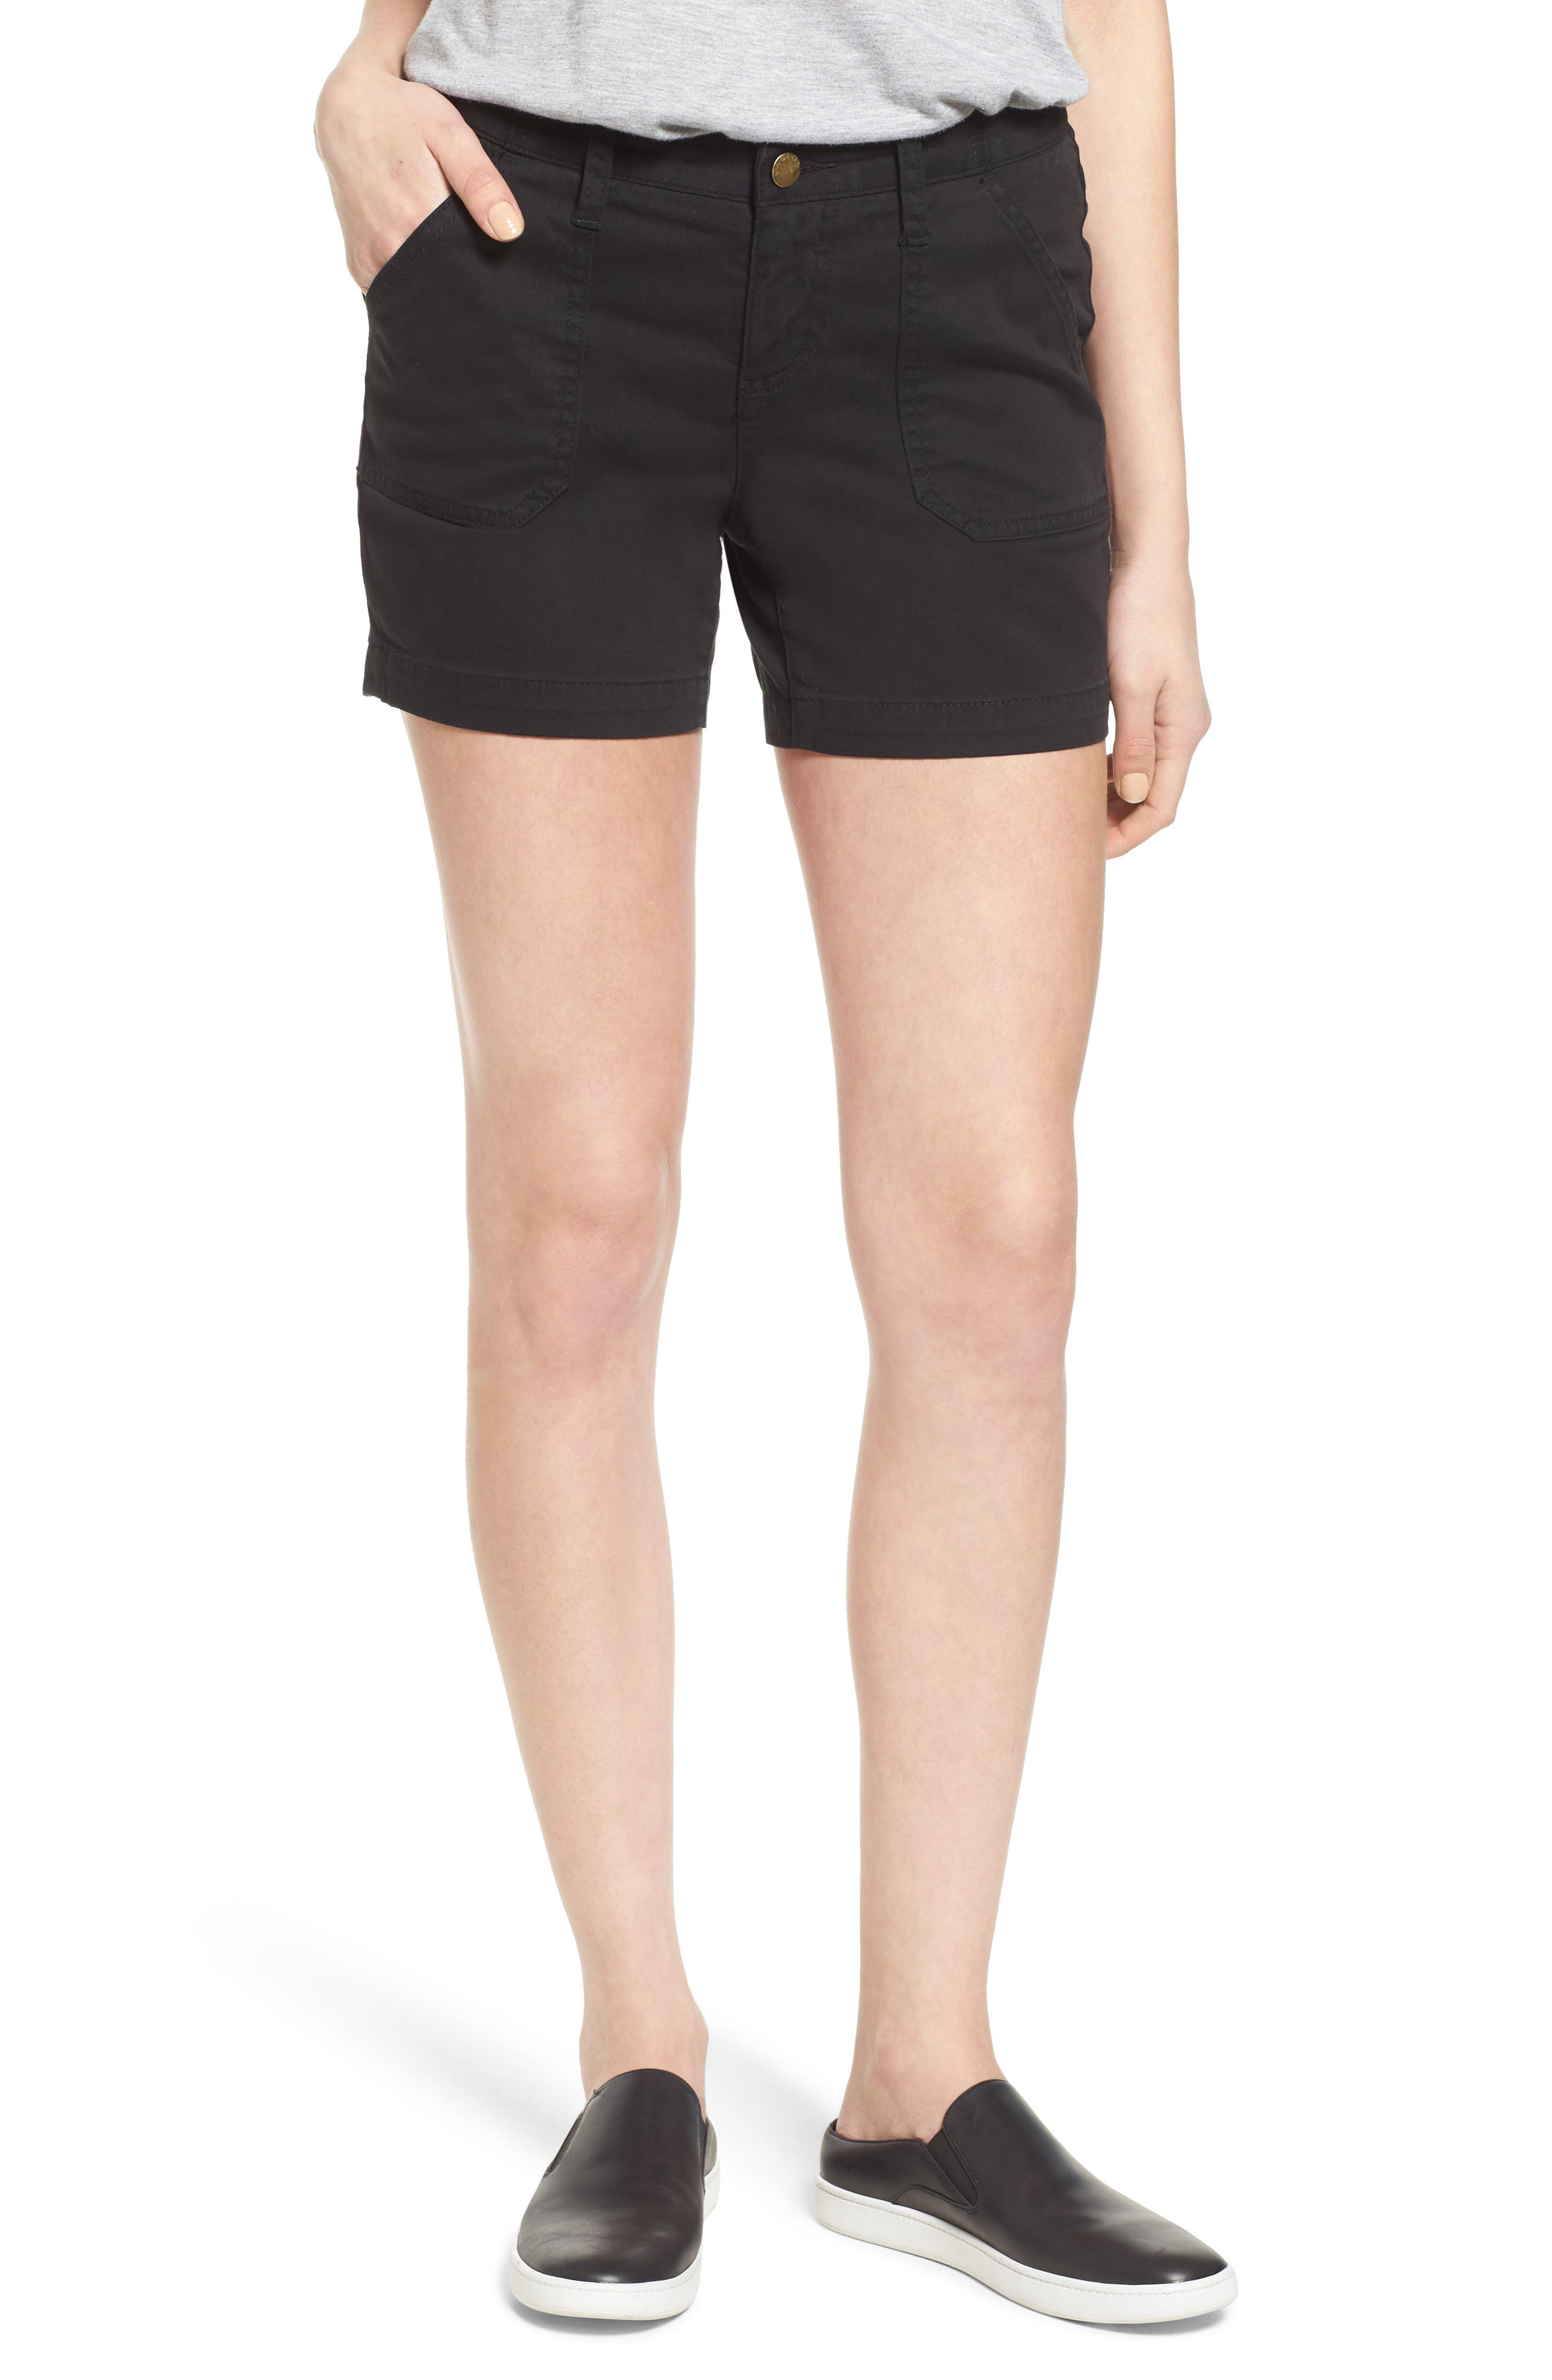 black shorts womens